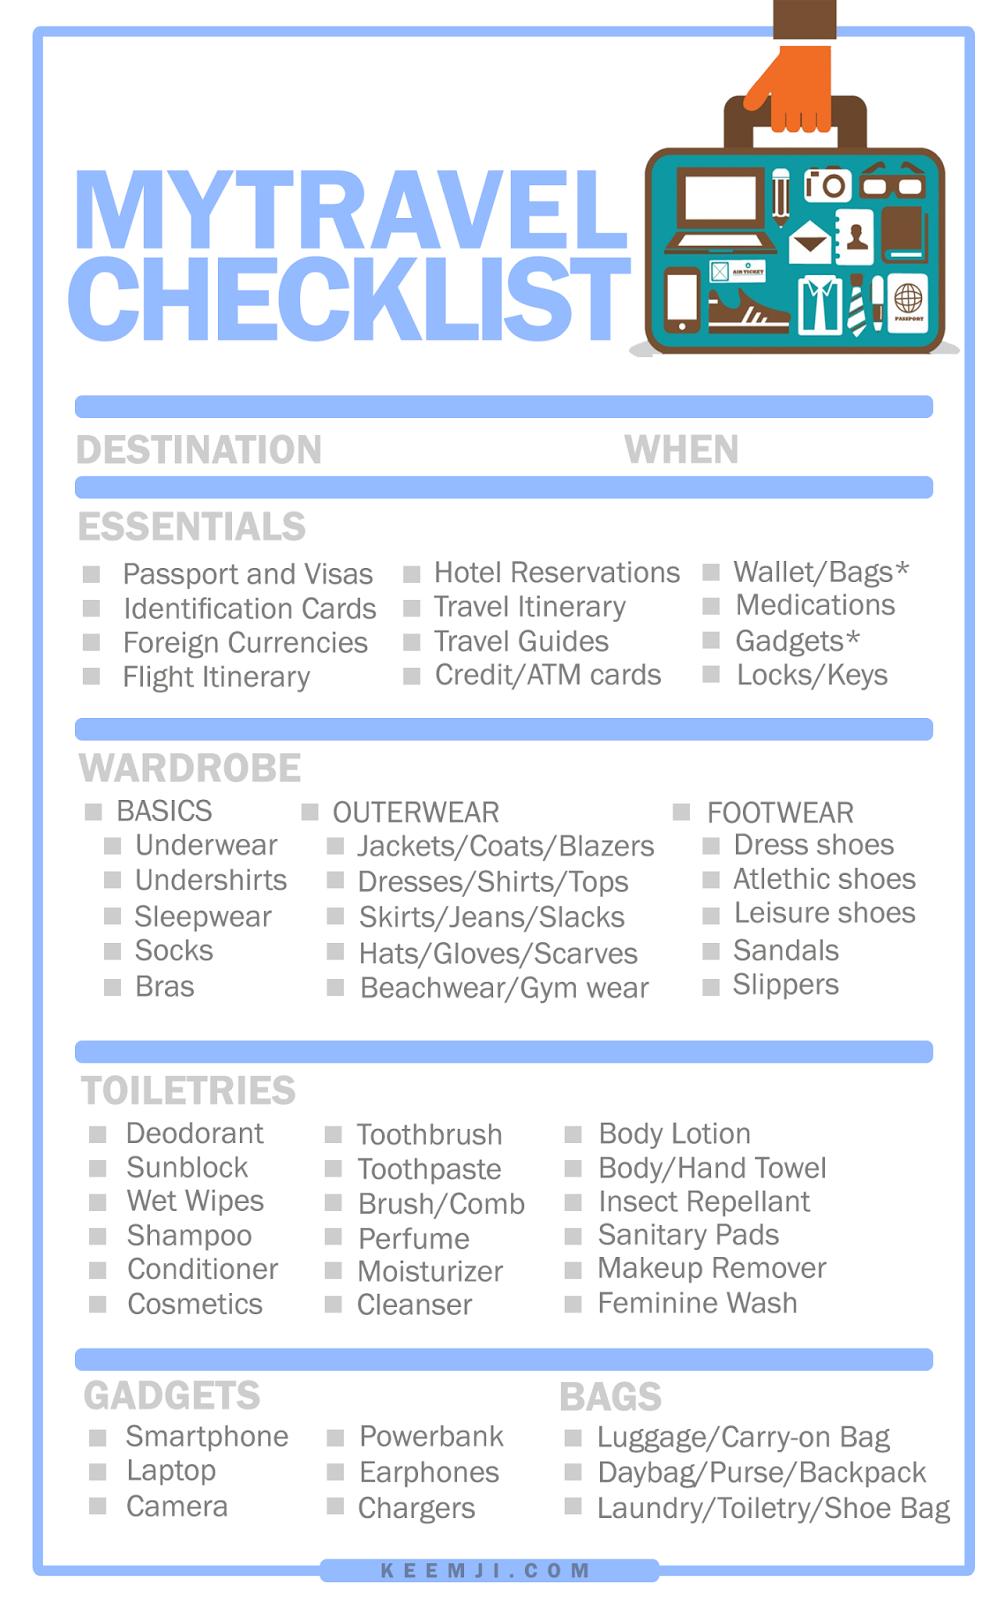 Travel Guide Pre Flight Check List Travel Guide Checklist Travel